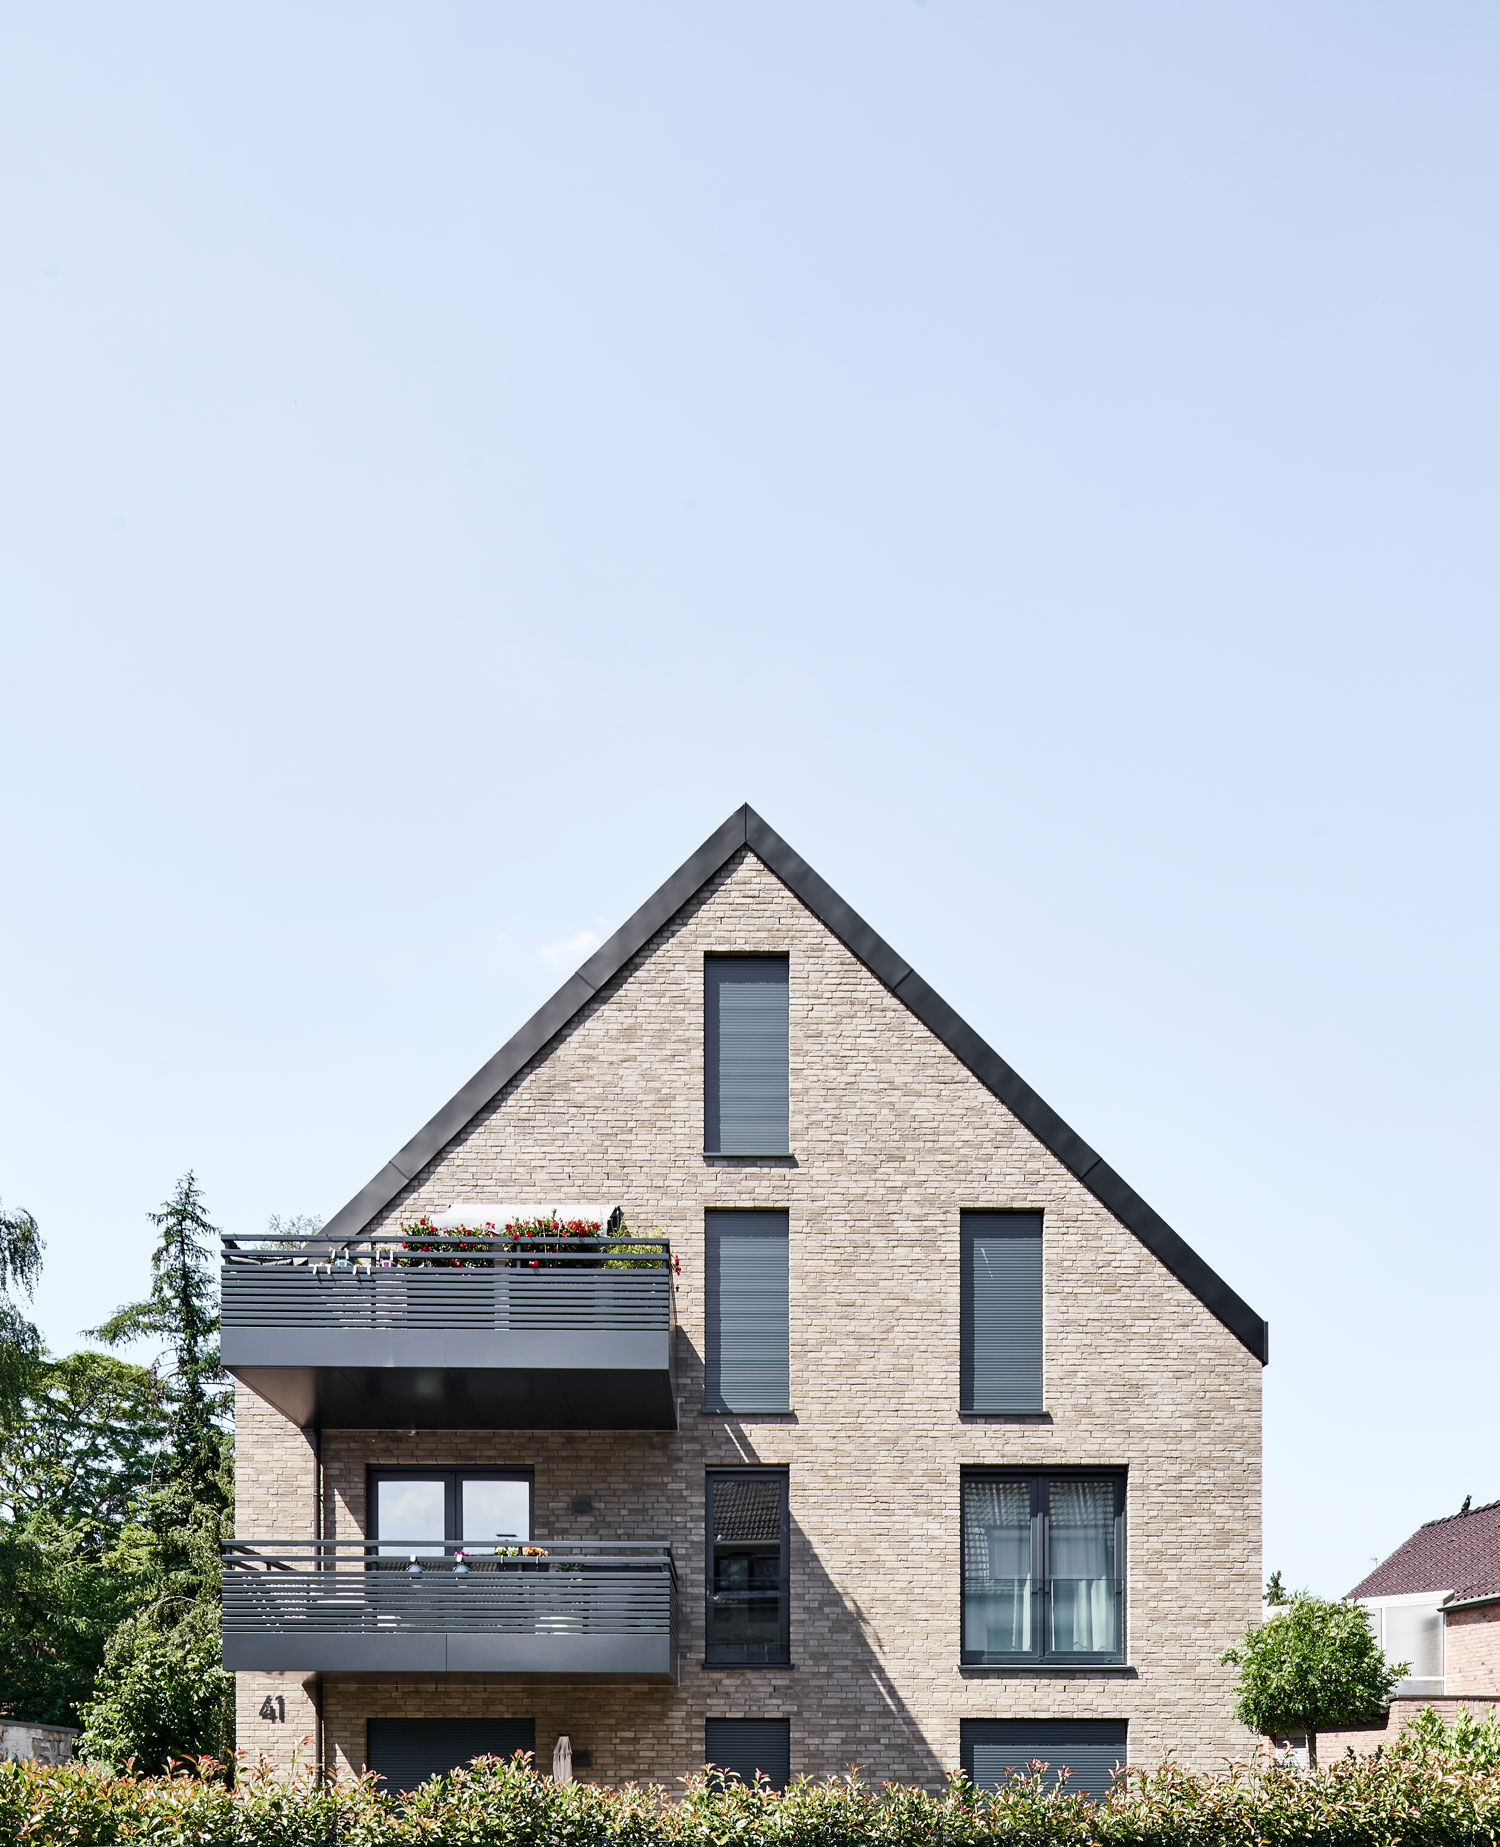 Neubau Mehrfamilienhaus in Düsseldorf, Hamm Foto: Annika Feuss